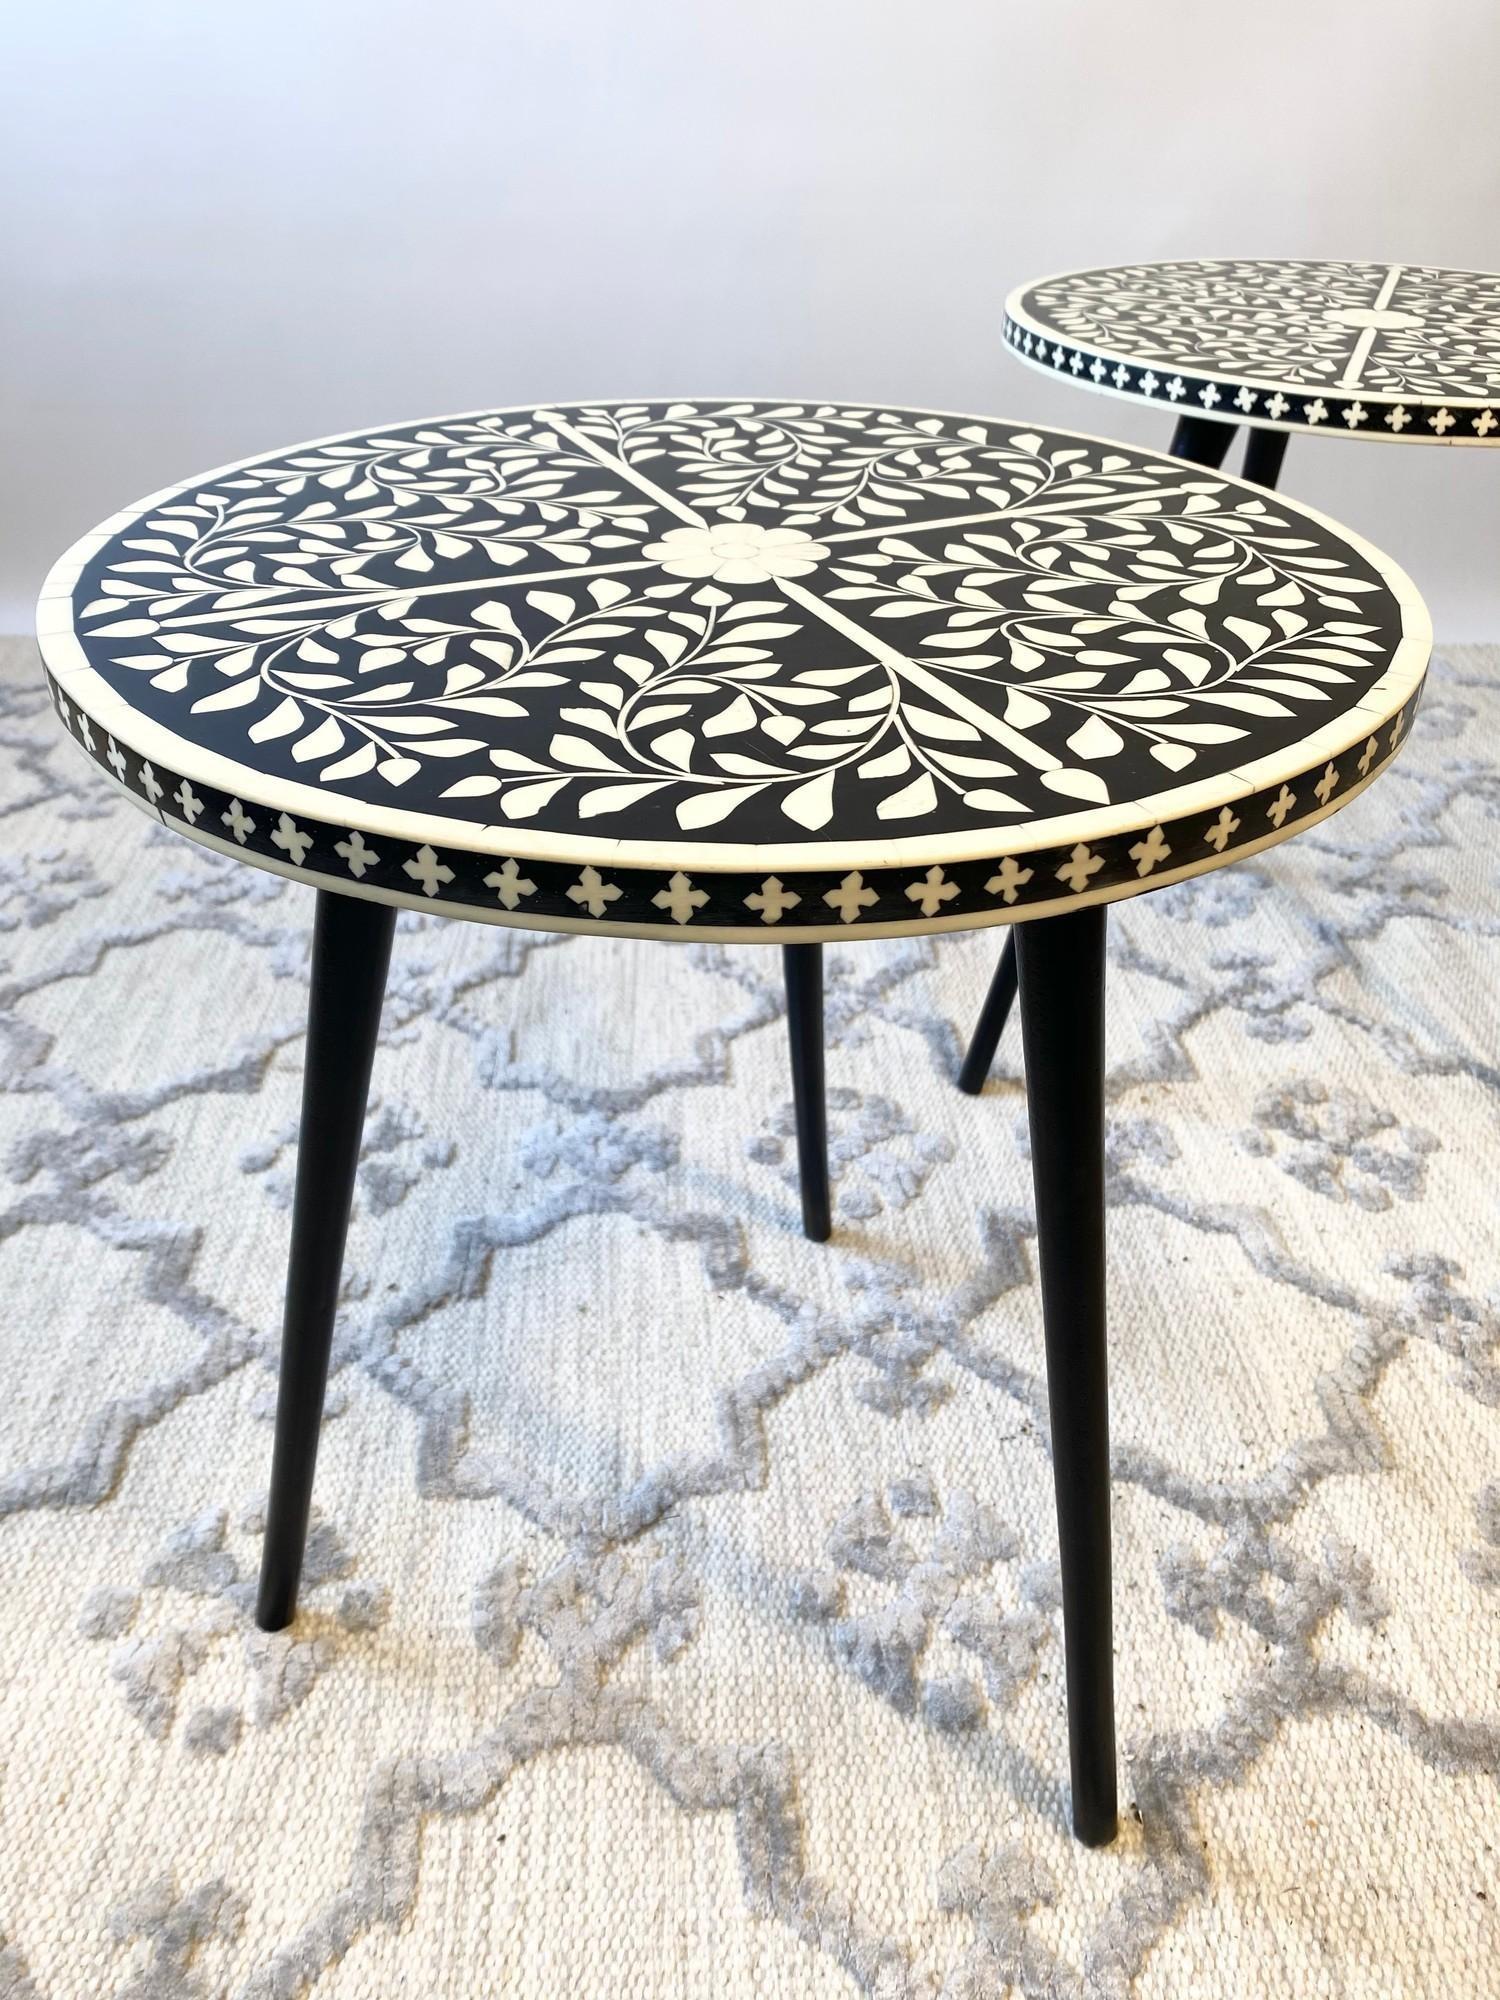 LAMP TABLES, a pair, Moorish design inlaid tops on tripod metal legs, 47cm H x 41cm x 41cm. (2) - Image 3 of 5